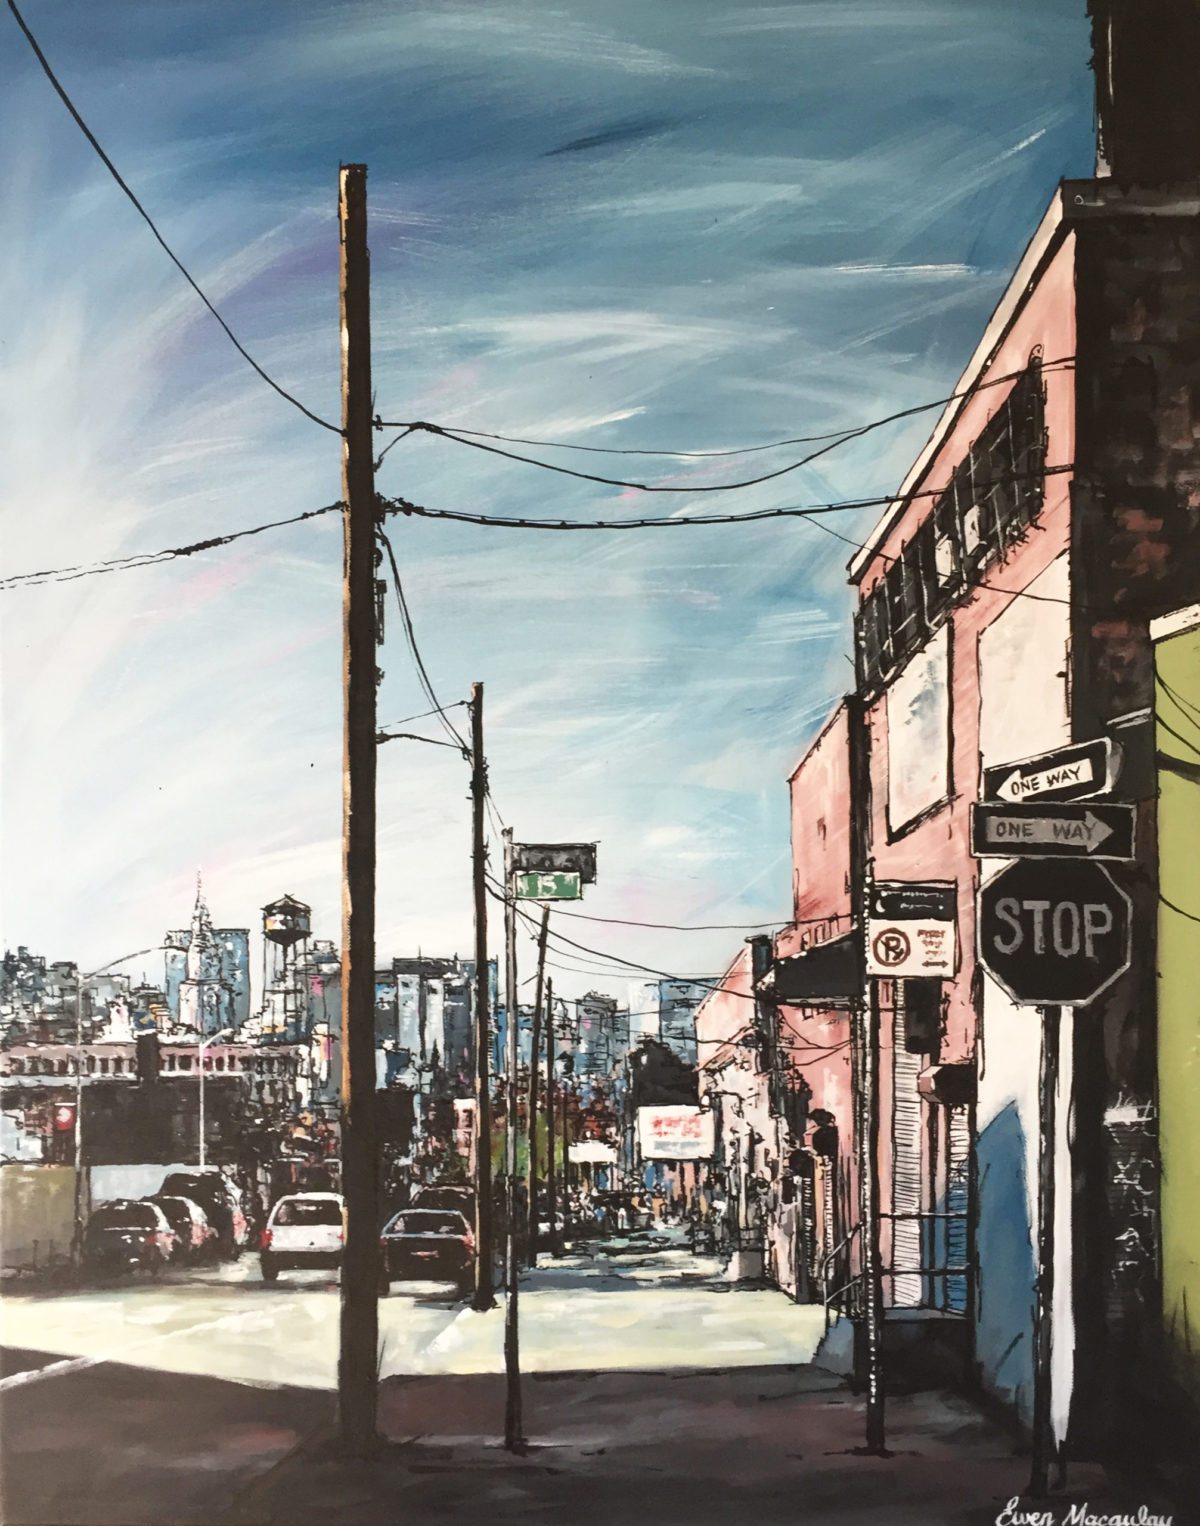 Brooklyn NYC by artist Ewen Macaulay